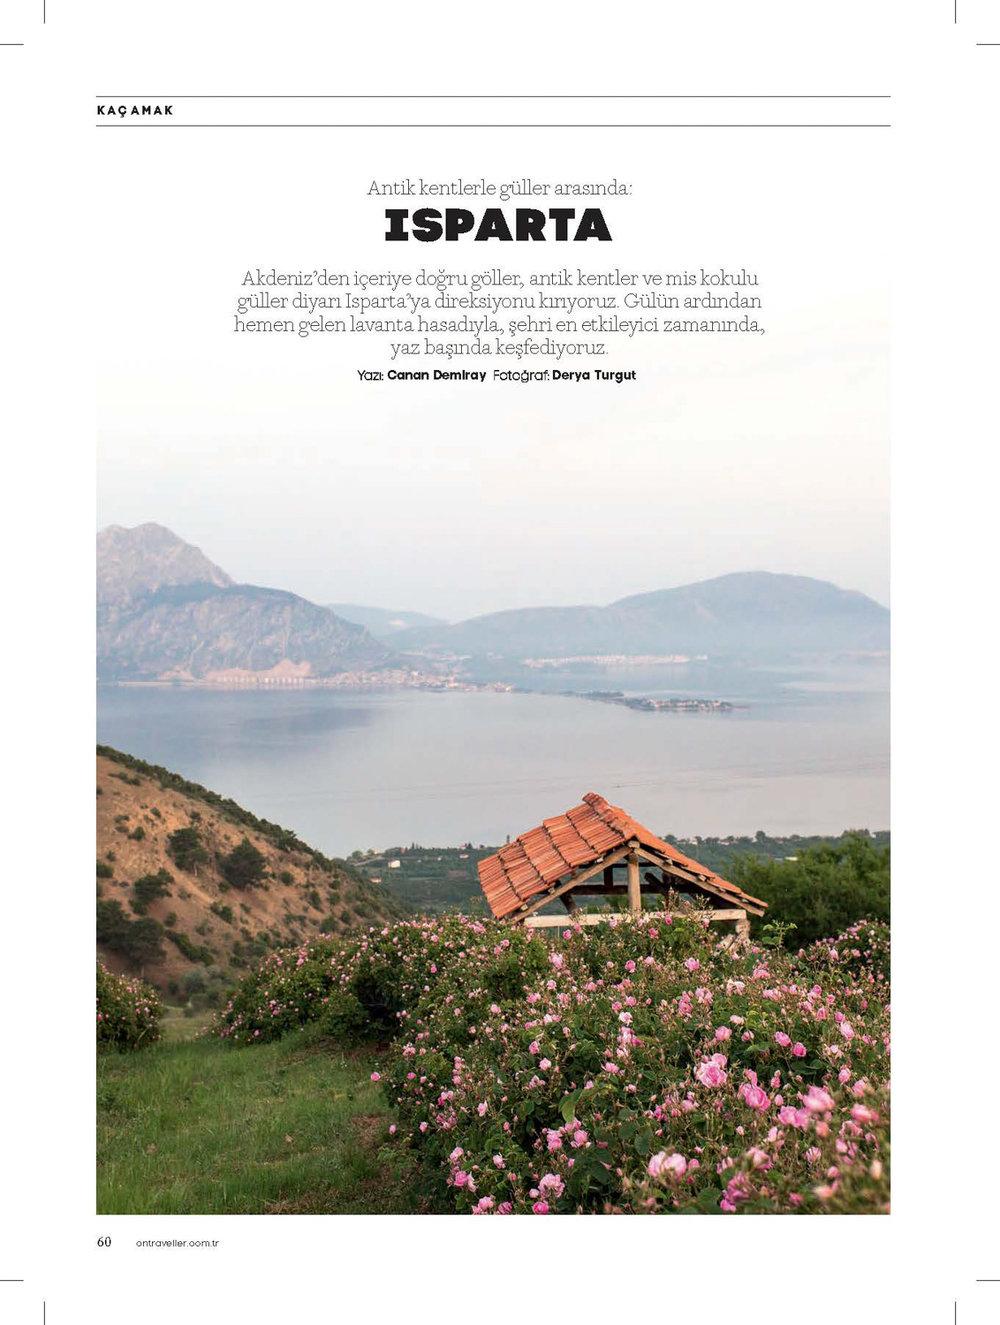 isparta cnt_Page_1.jpg